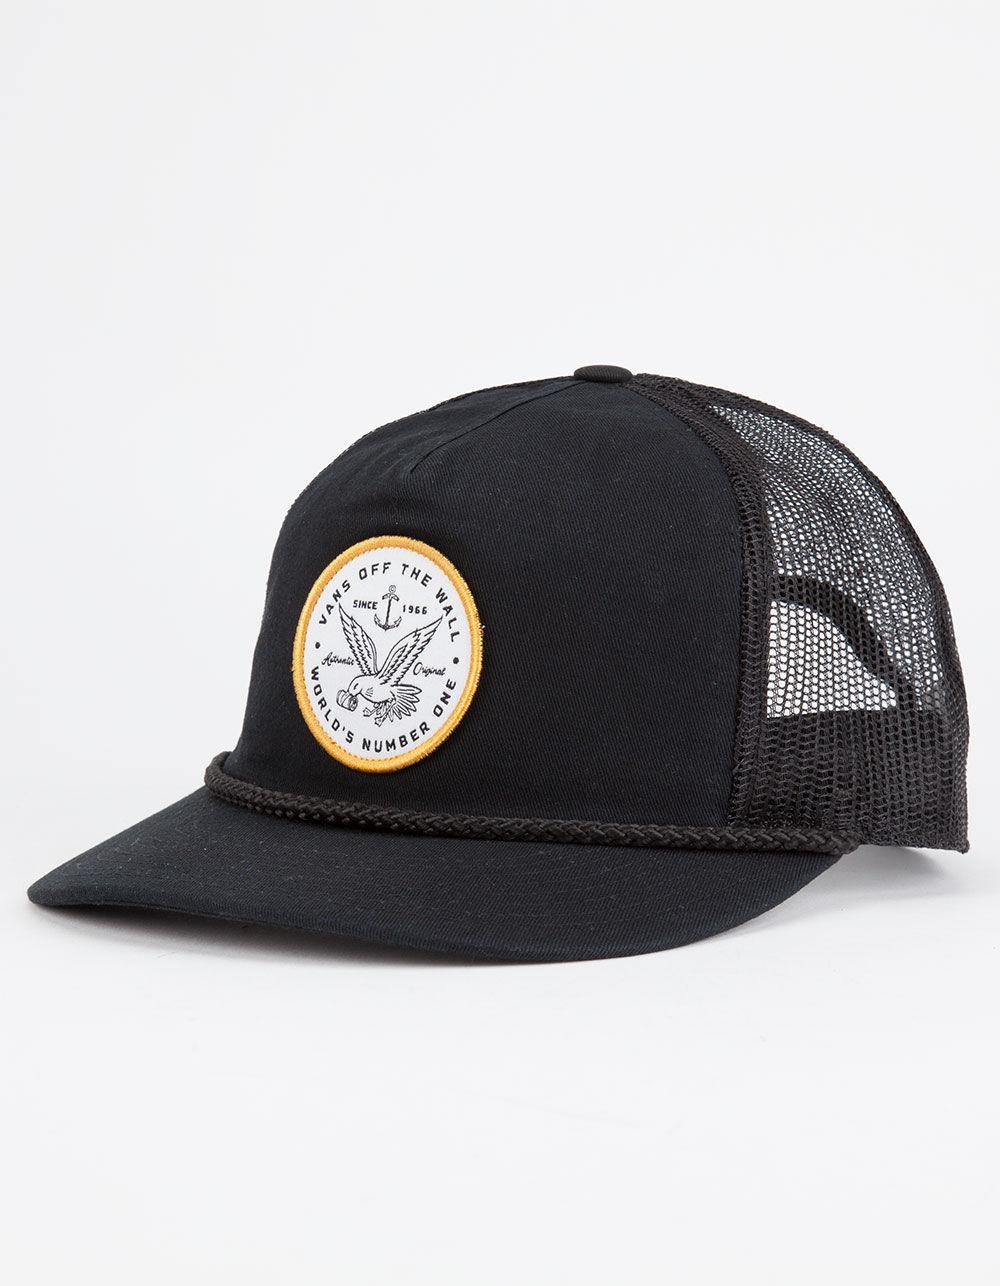 Lyst - Vans Fremont Mens Trucker Hat in Black for Men bb1ab7ddd082